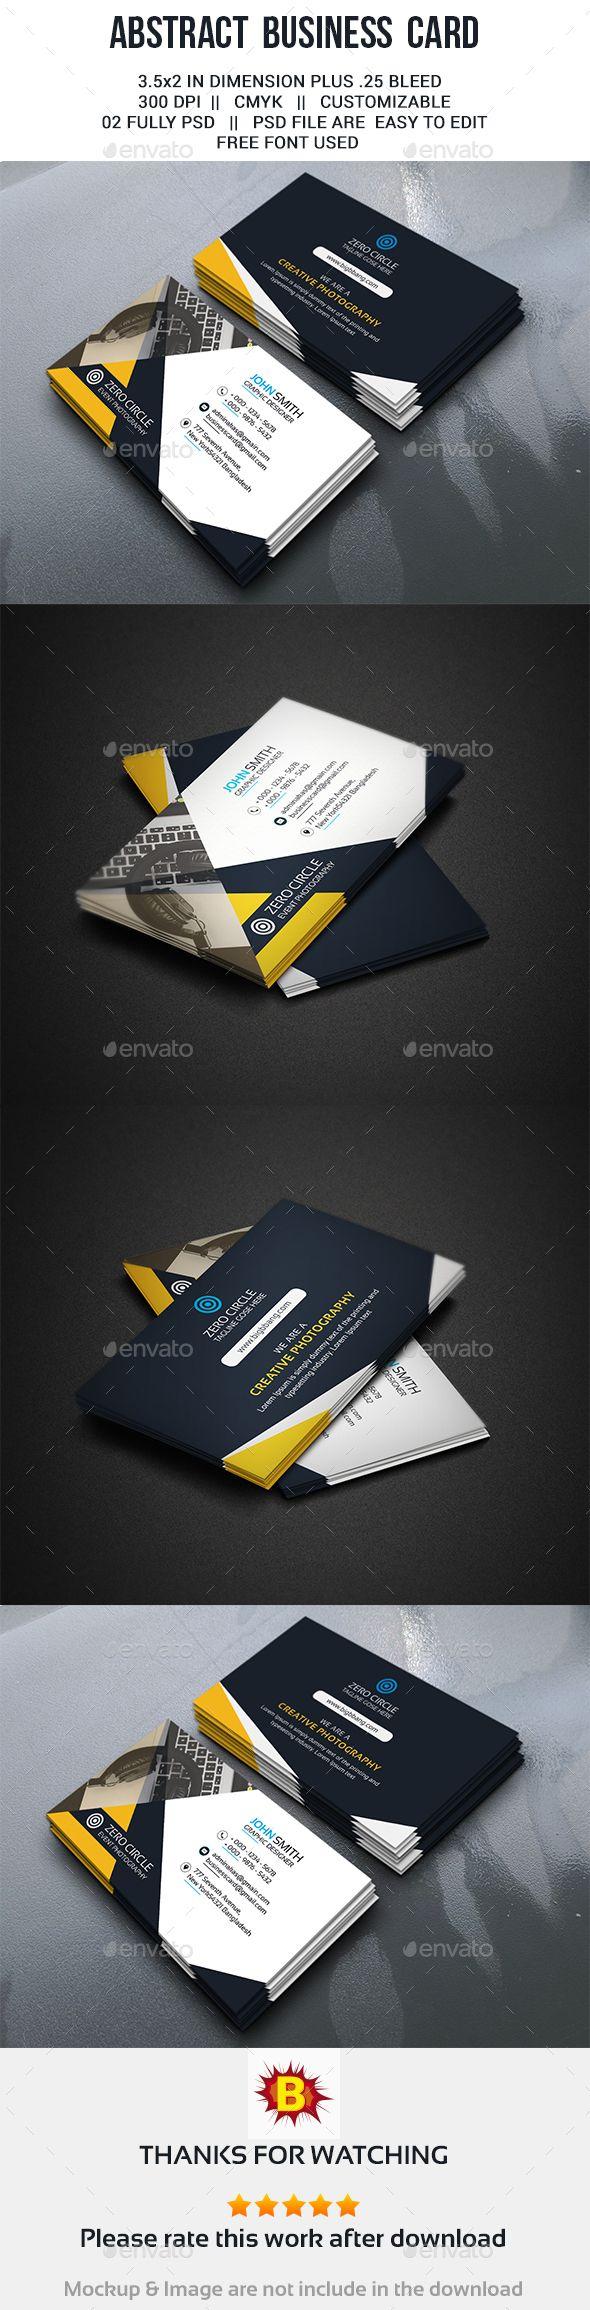 437 Best Business Card Images On Pinterest Business Card Design